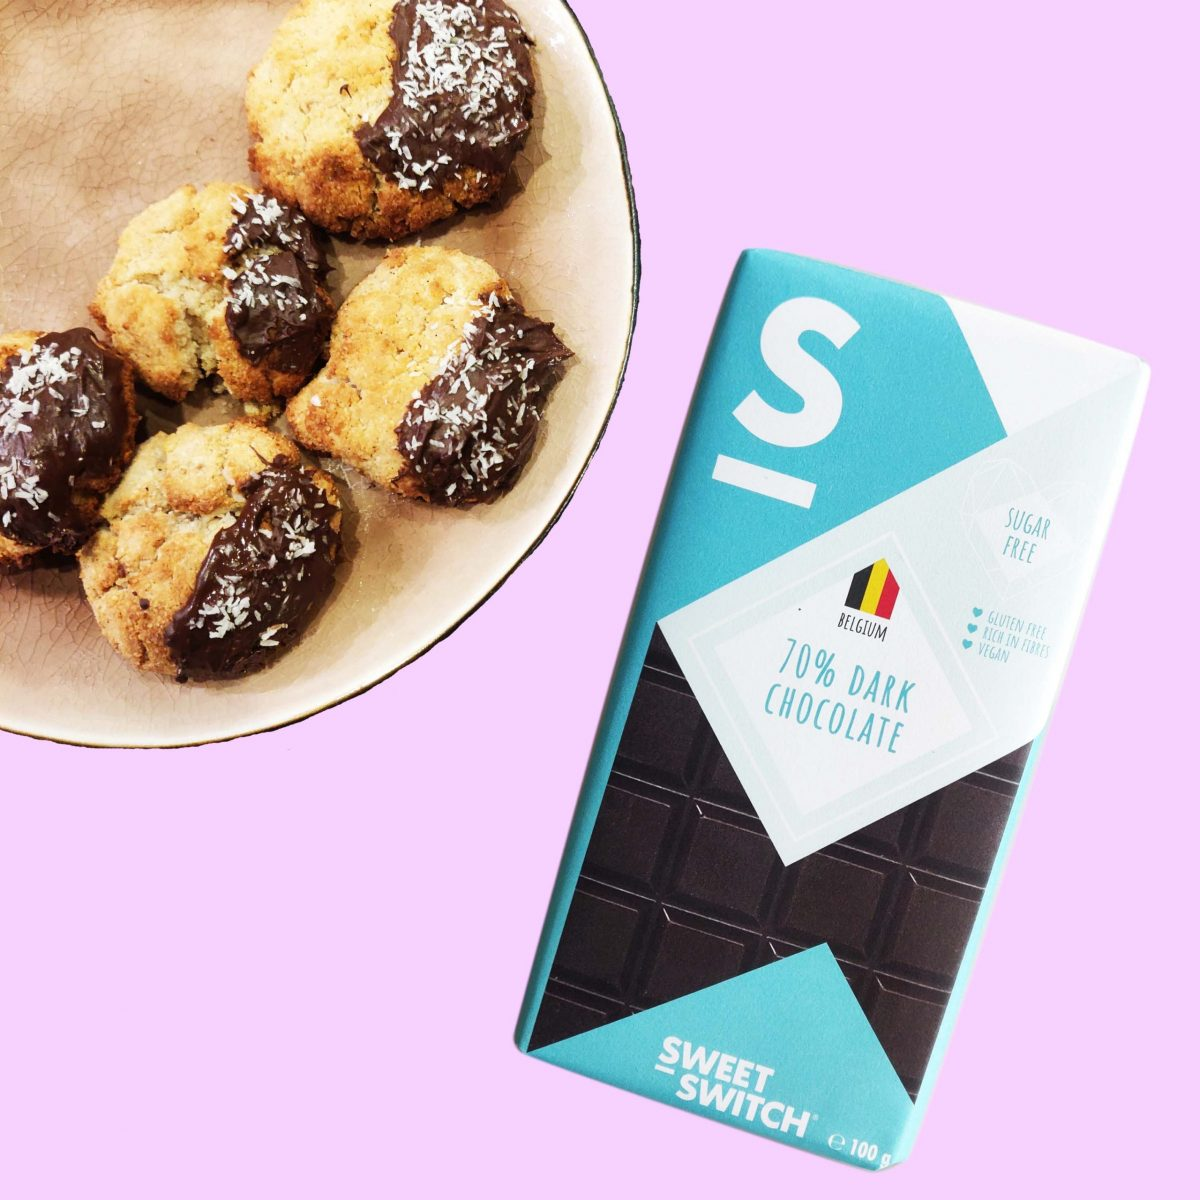 sugar free confectionery heaven SWEET-SWITCH 70% dark chocolate